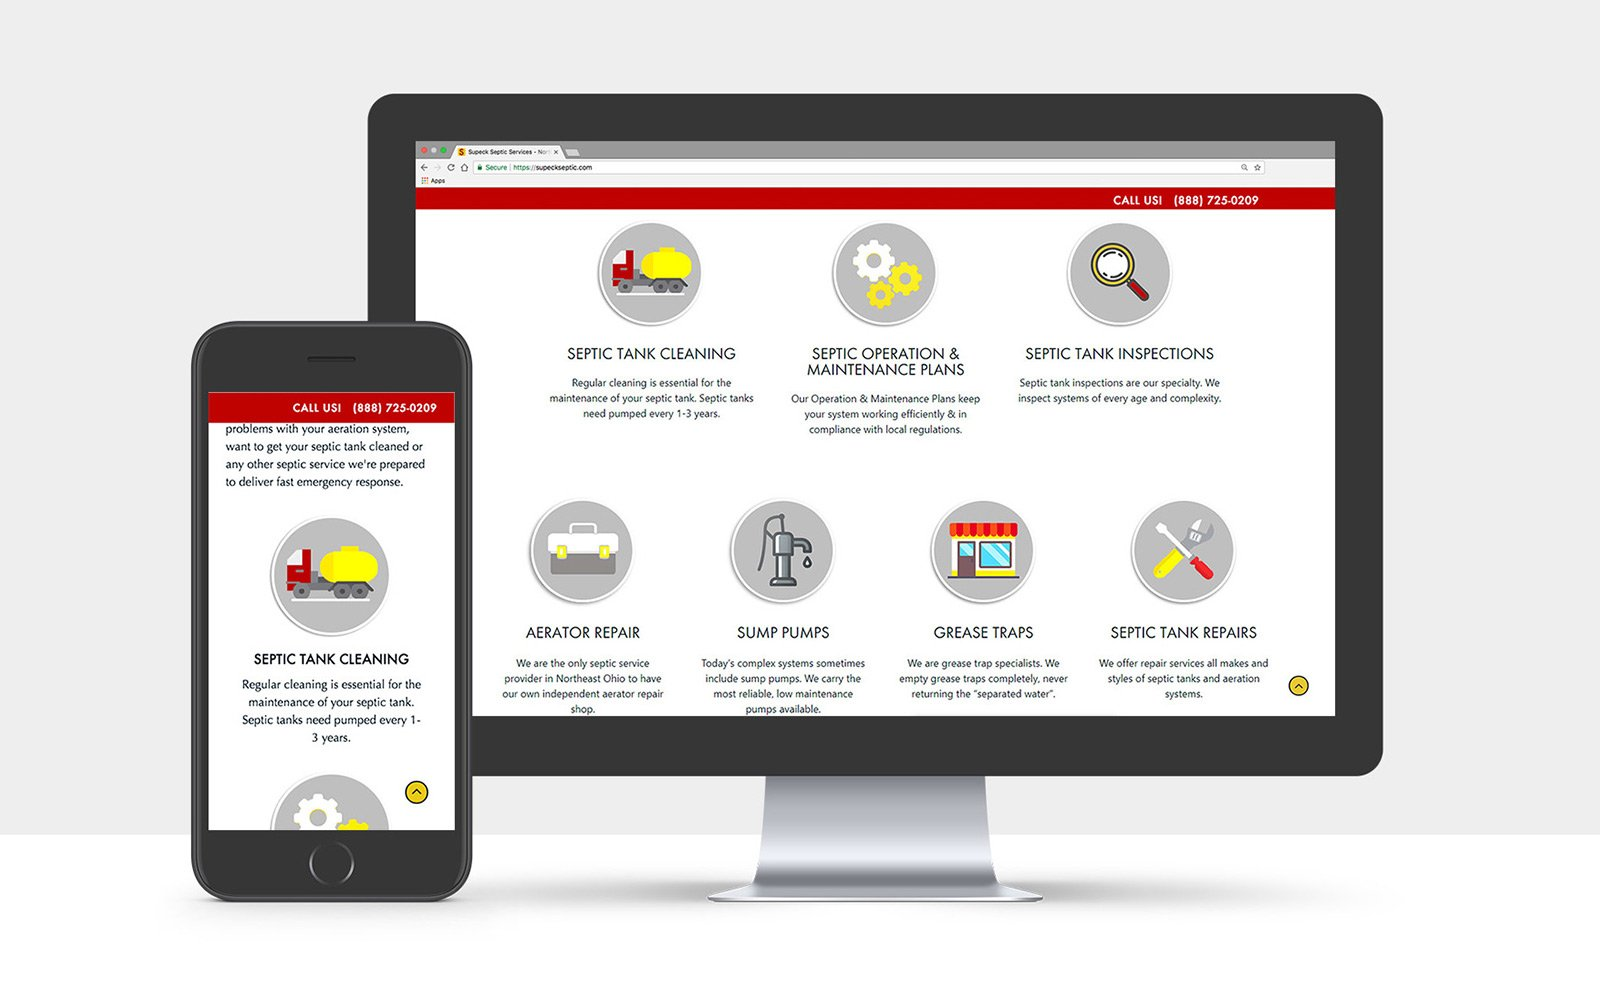 Website Design Mockups for Supeck Septic Services on Desktop and iPhone